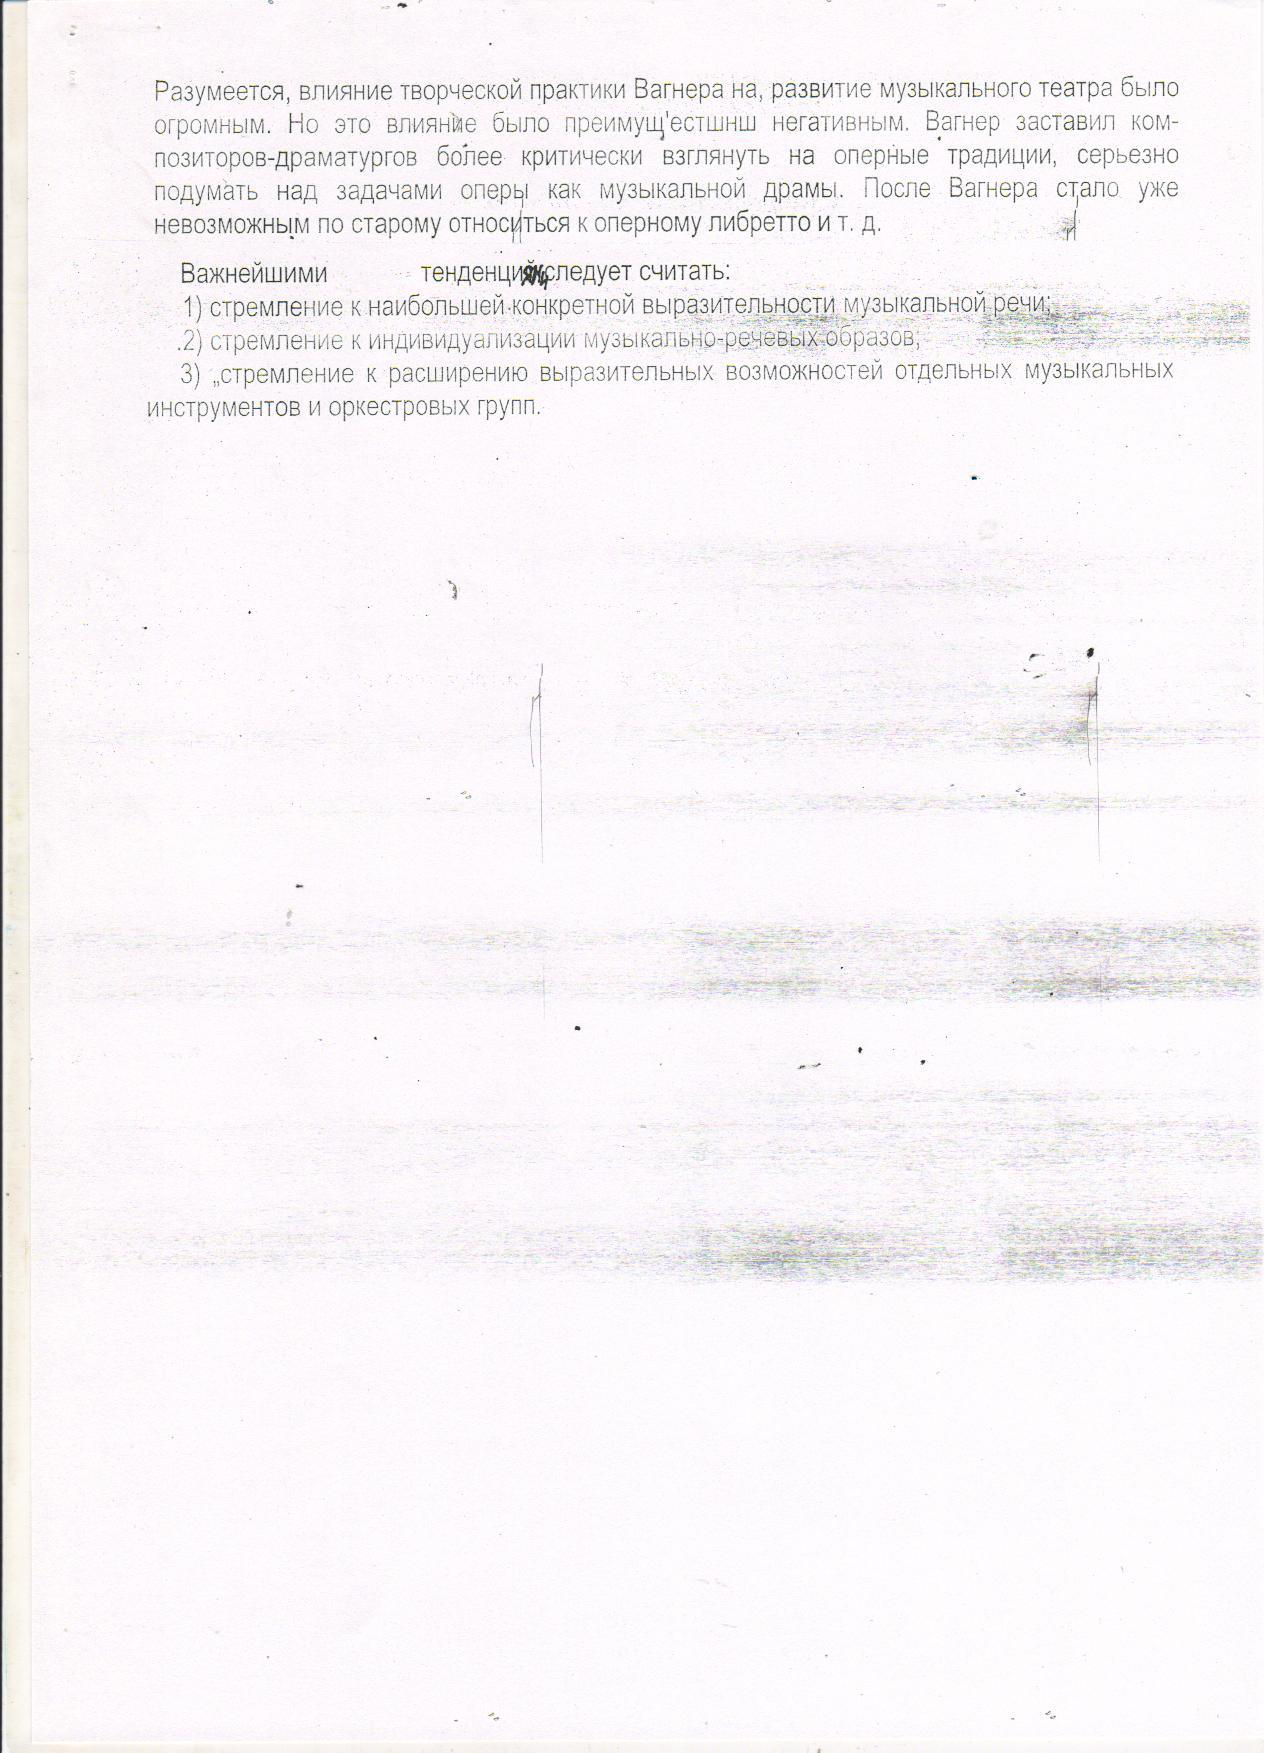 C:\Documents and Settings\Учитель\Рабочий стол\11 001.jpg